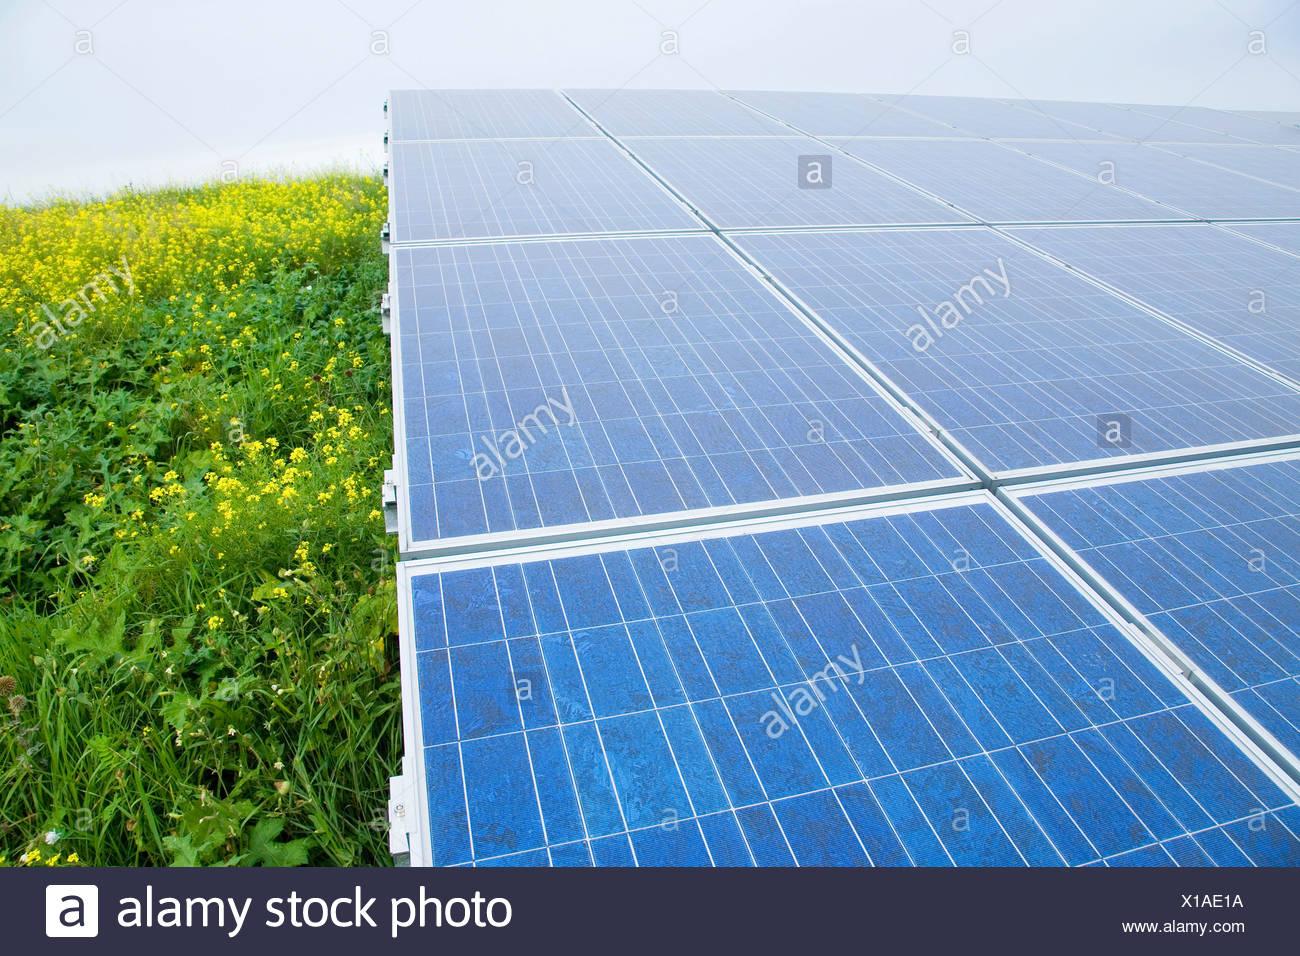 Germany, Bavaria, solar panels - Stock Image